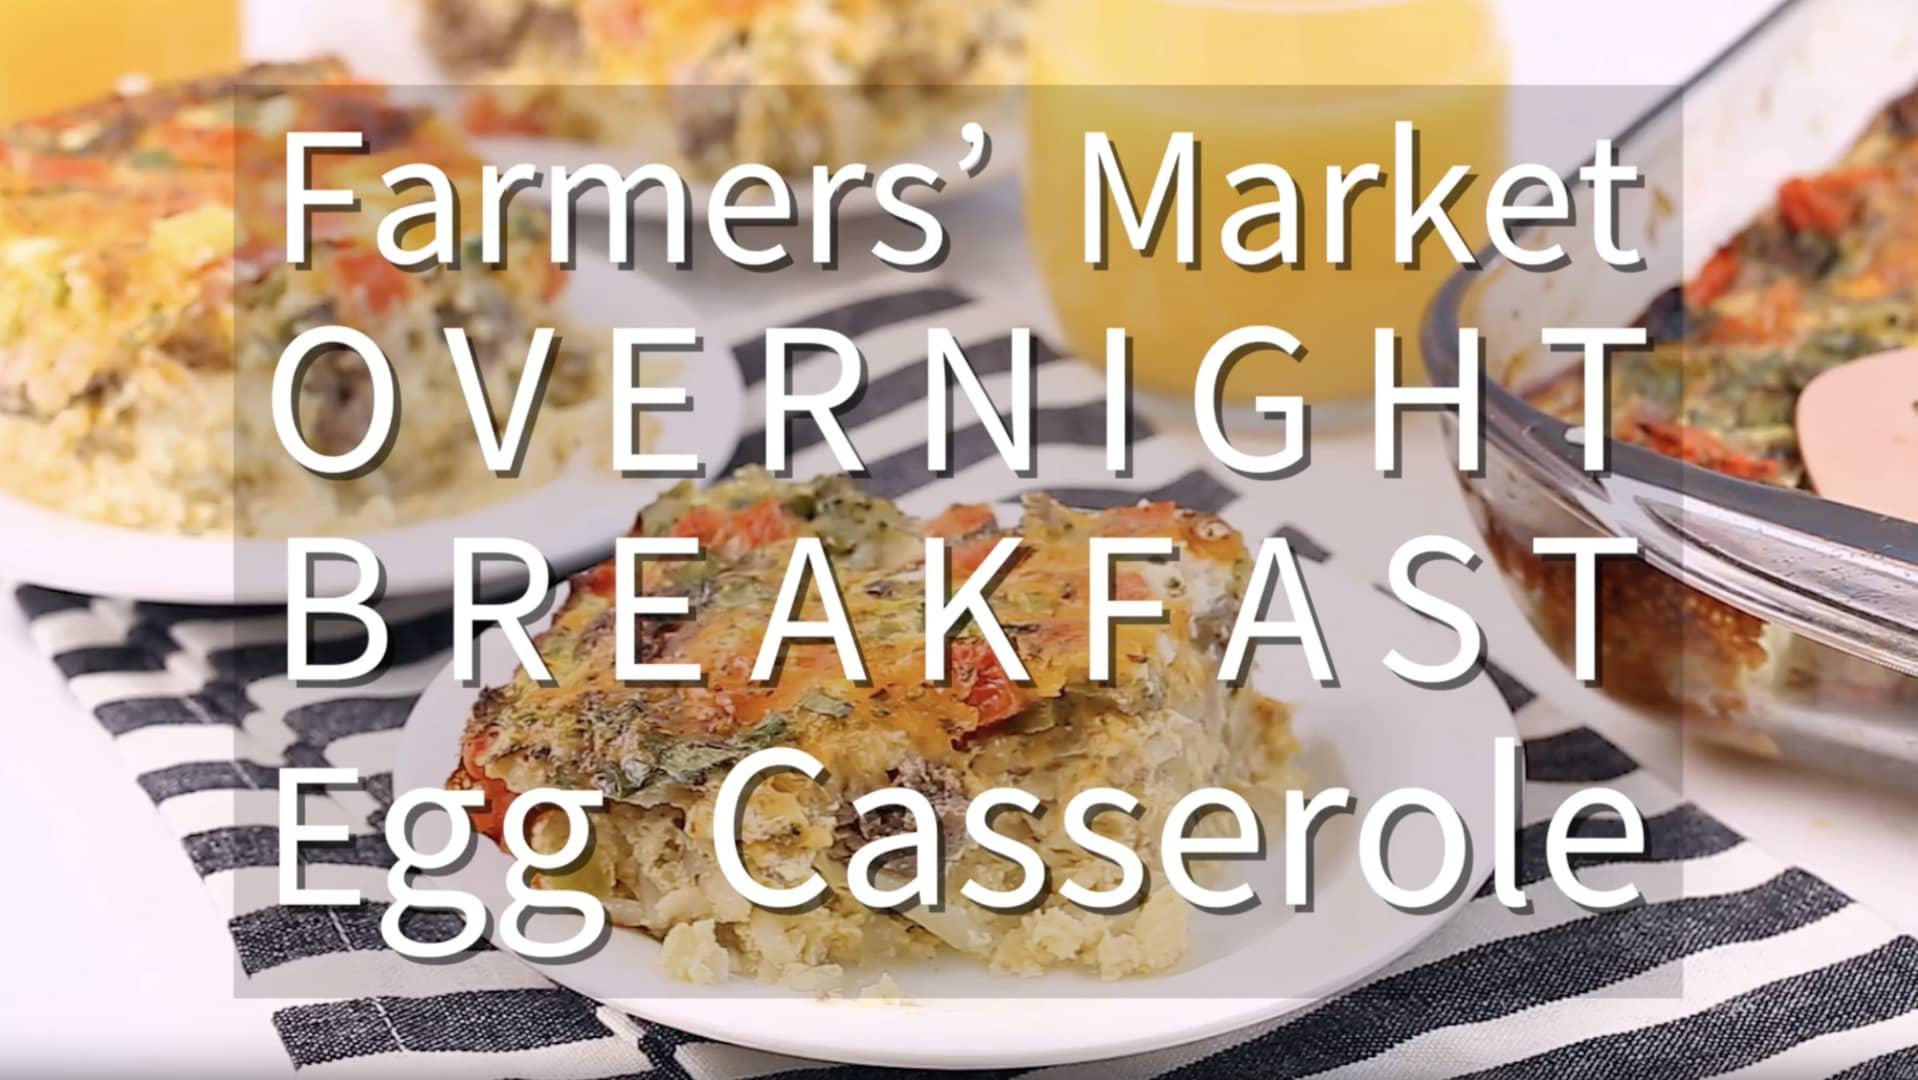 Farmers market overnight breakfast egg casserole forumfinder Gallery